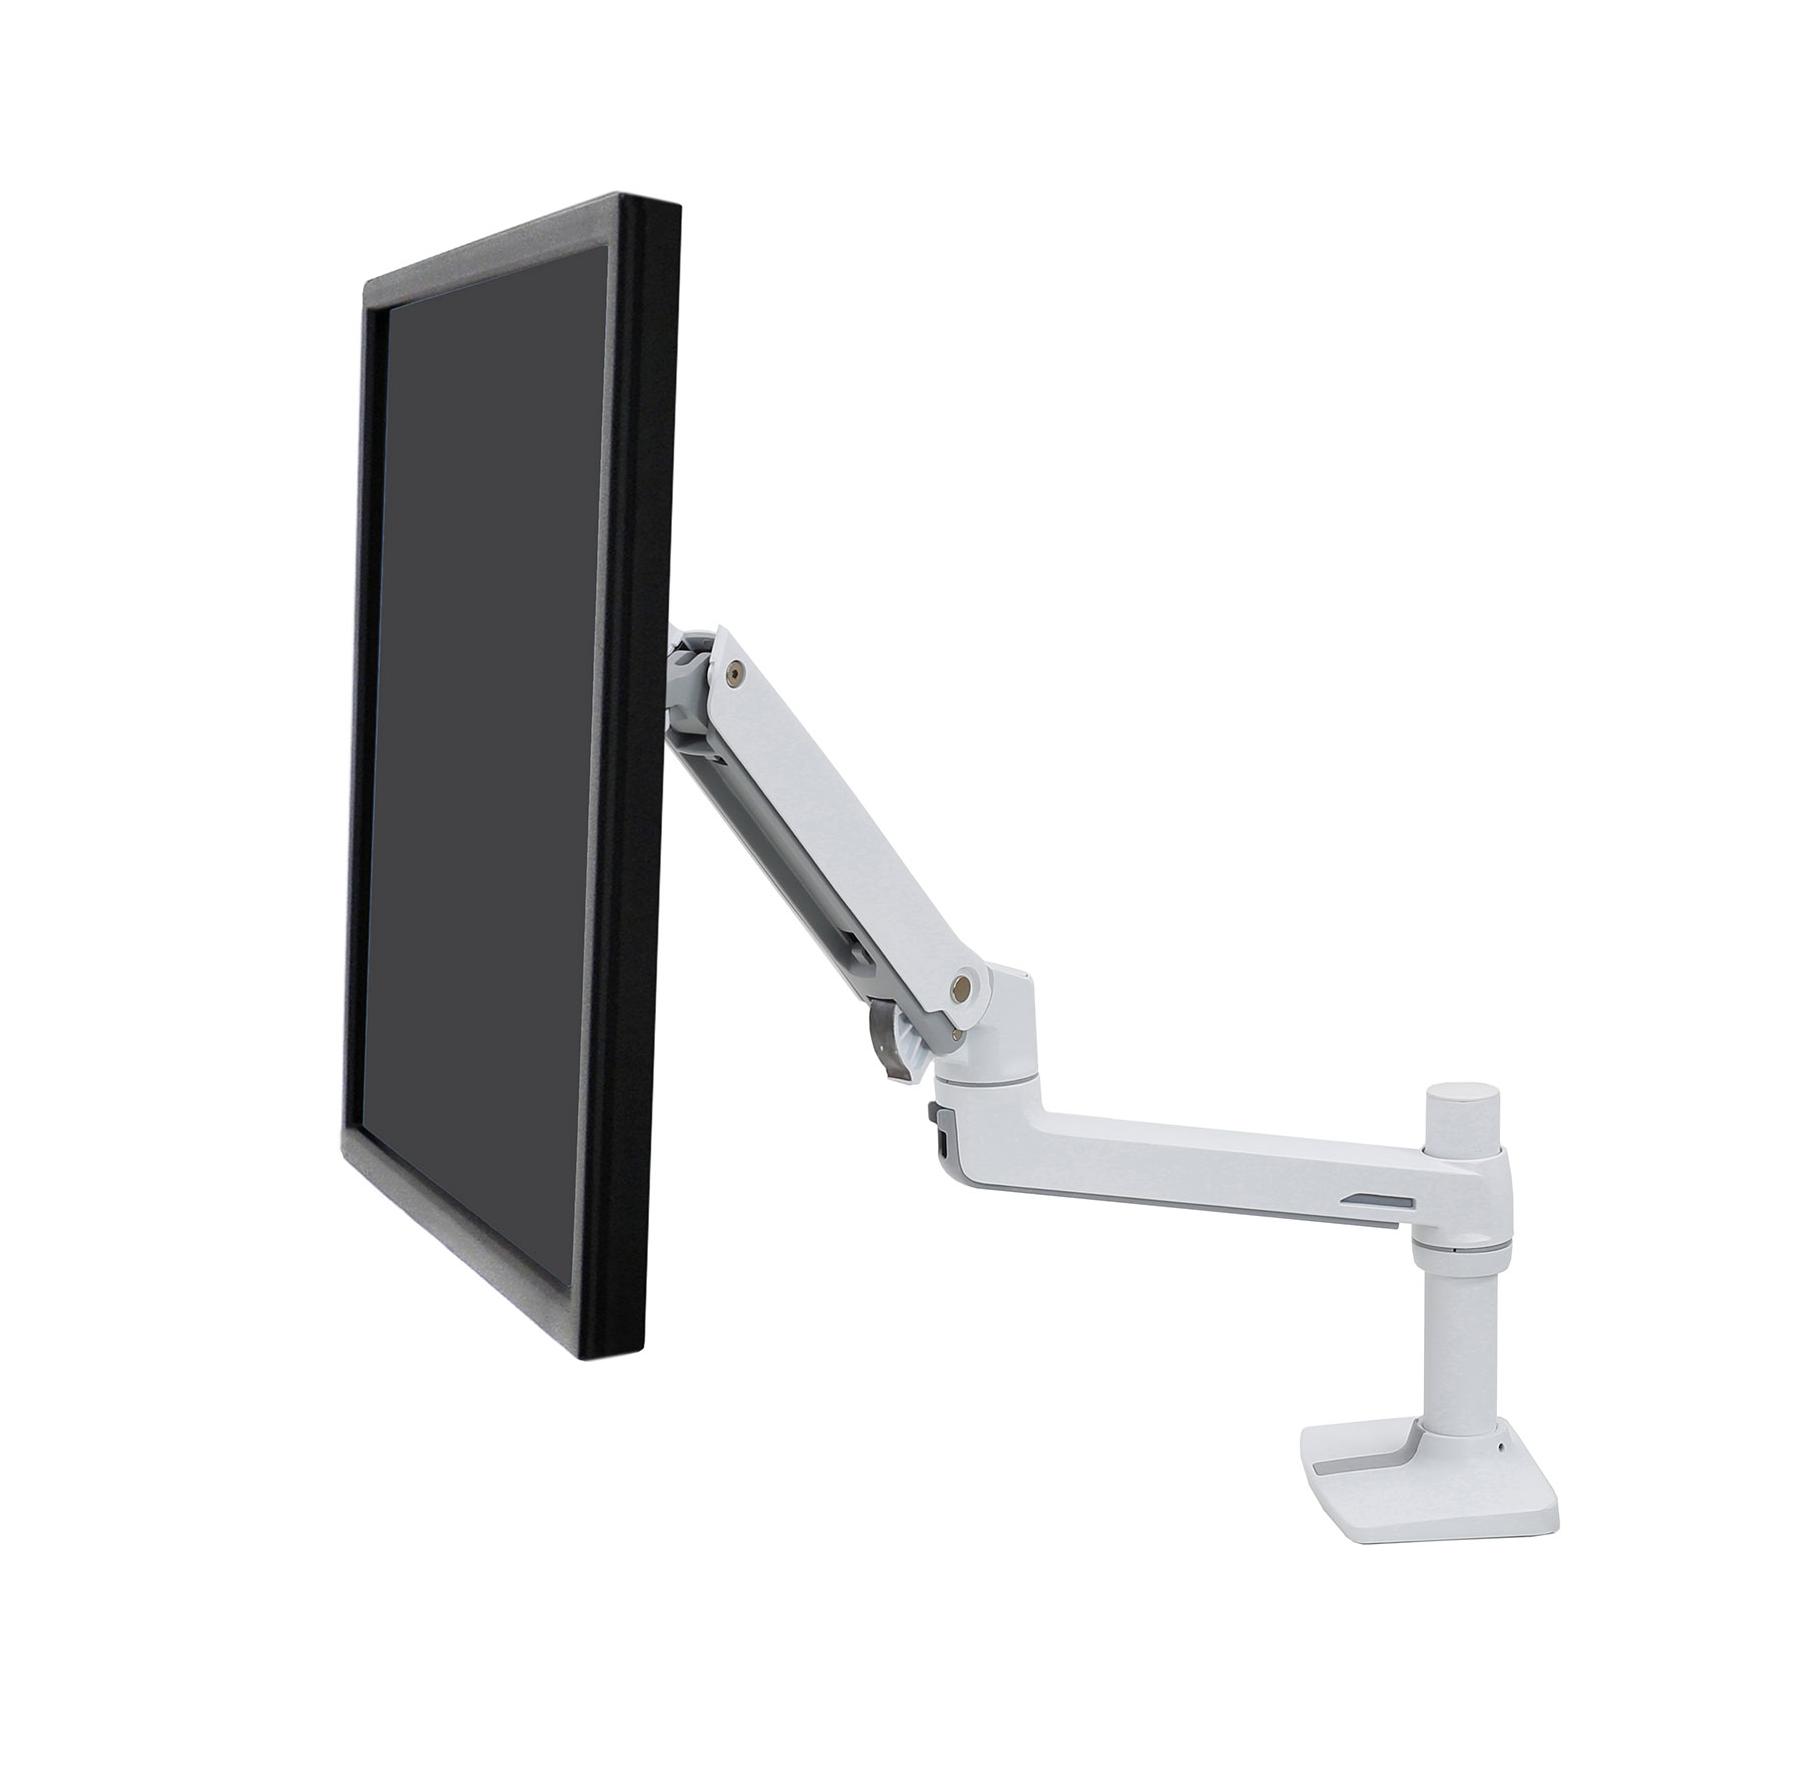 Accessories: Haworth + Ergotron Monitor Arms